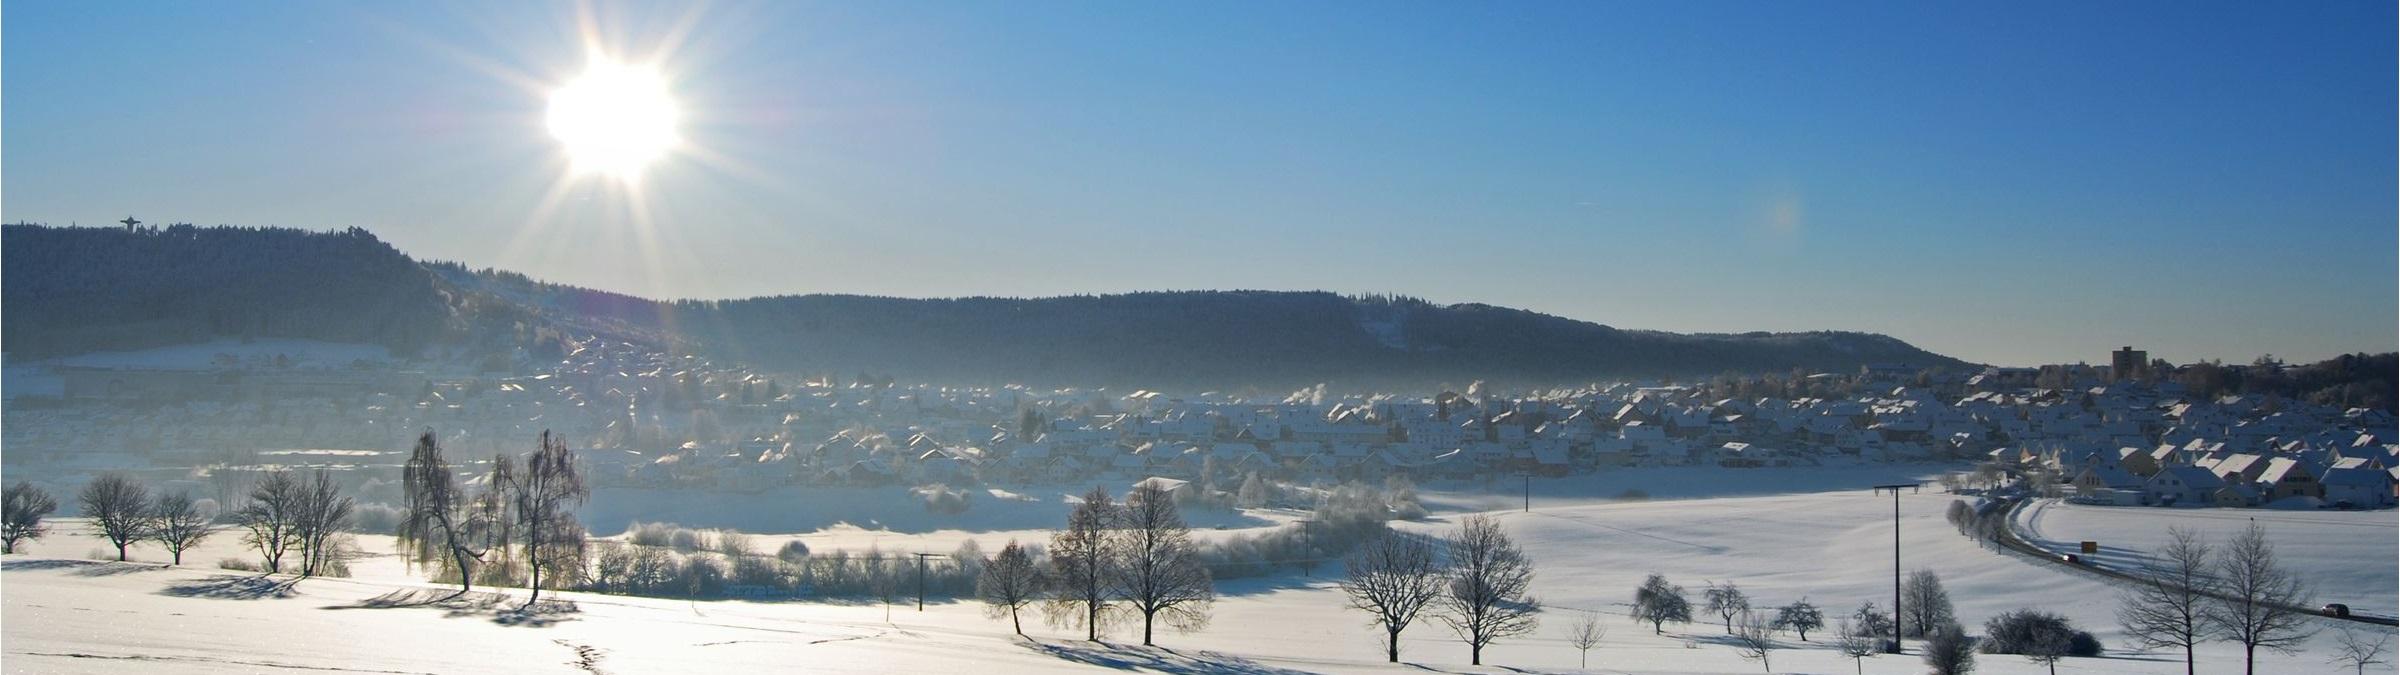 winterbild_gosheim-heuberg